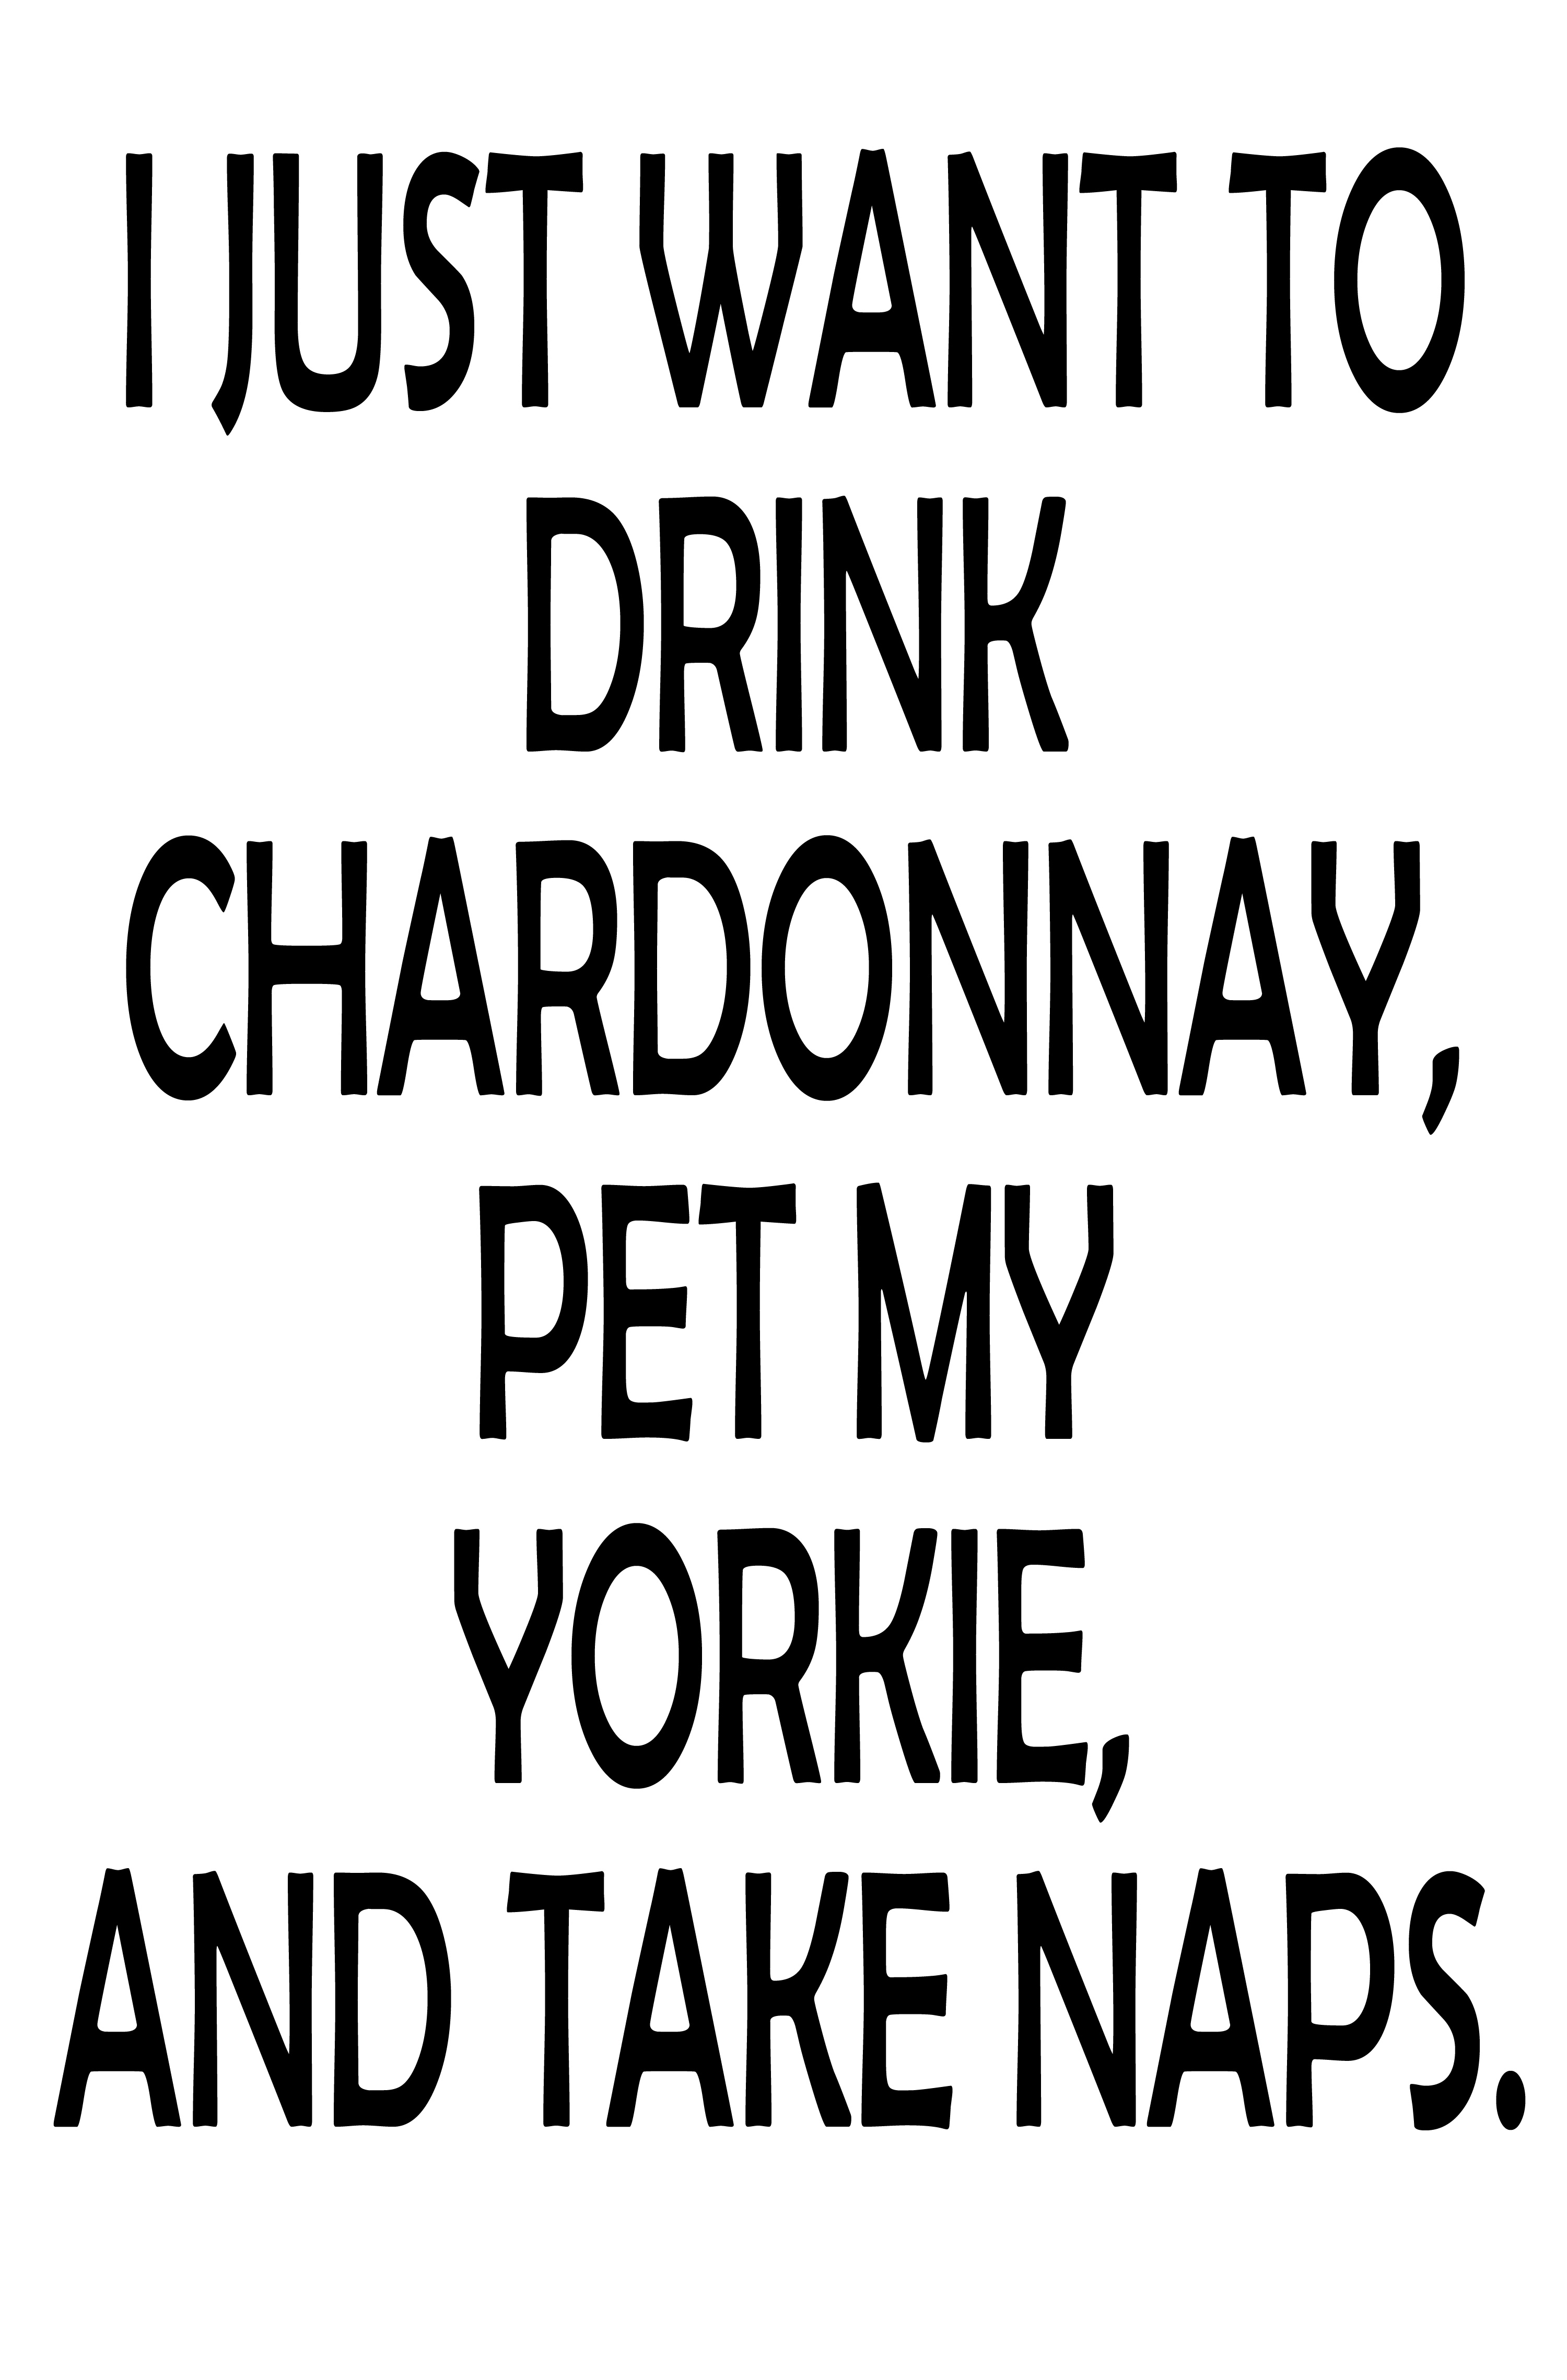 https://0901.nccdn.net/4_2/000/000/008/486/gosexyca-drink-chardonnay-3000x4557.jpg